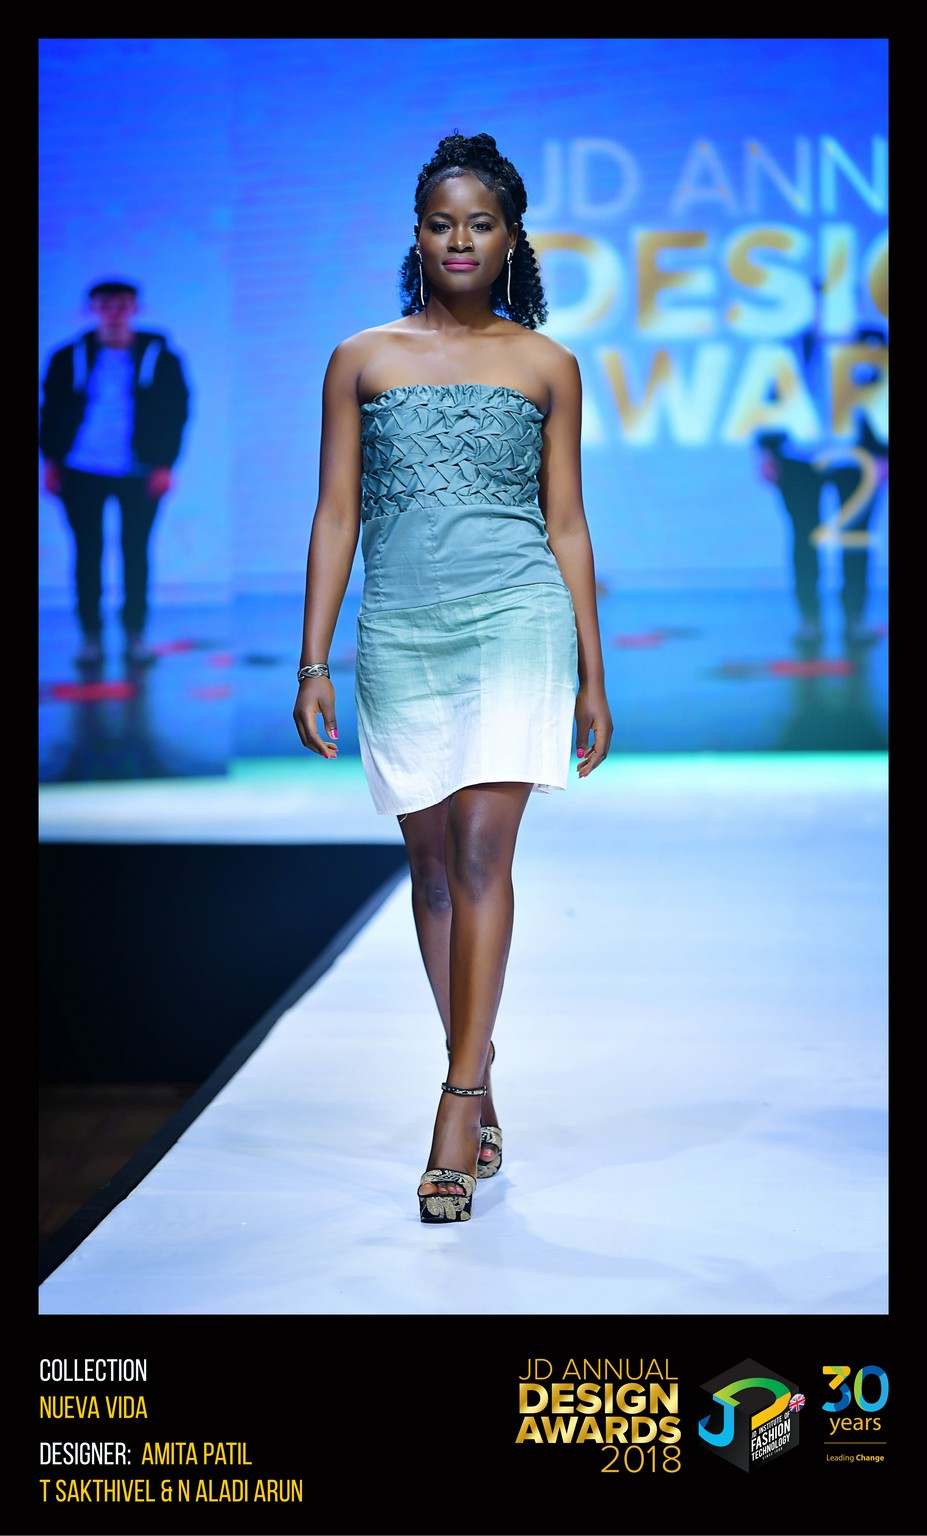 Nueva Vida – Change – JD Annual Design Awards 2018   Designer: Shakthi, Arun and Amitha   Photography : Jerin Nath (@jerin_nath) nueva vida - NUEVA VIDA 3 - Nueva Vida – Change – JD Annual Design Awards 2018